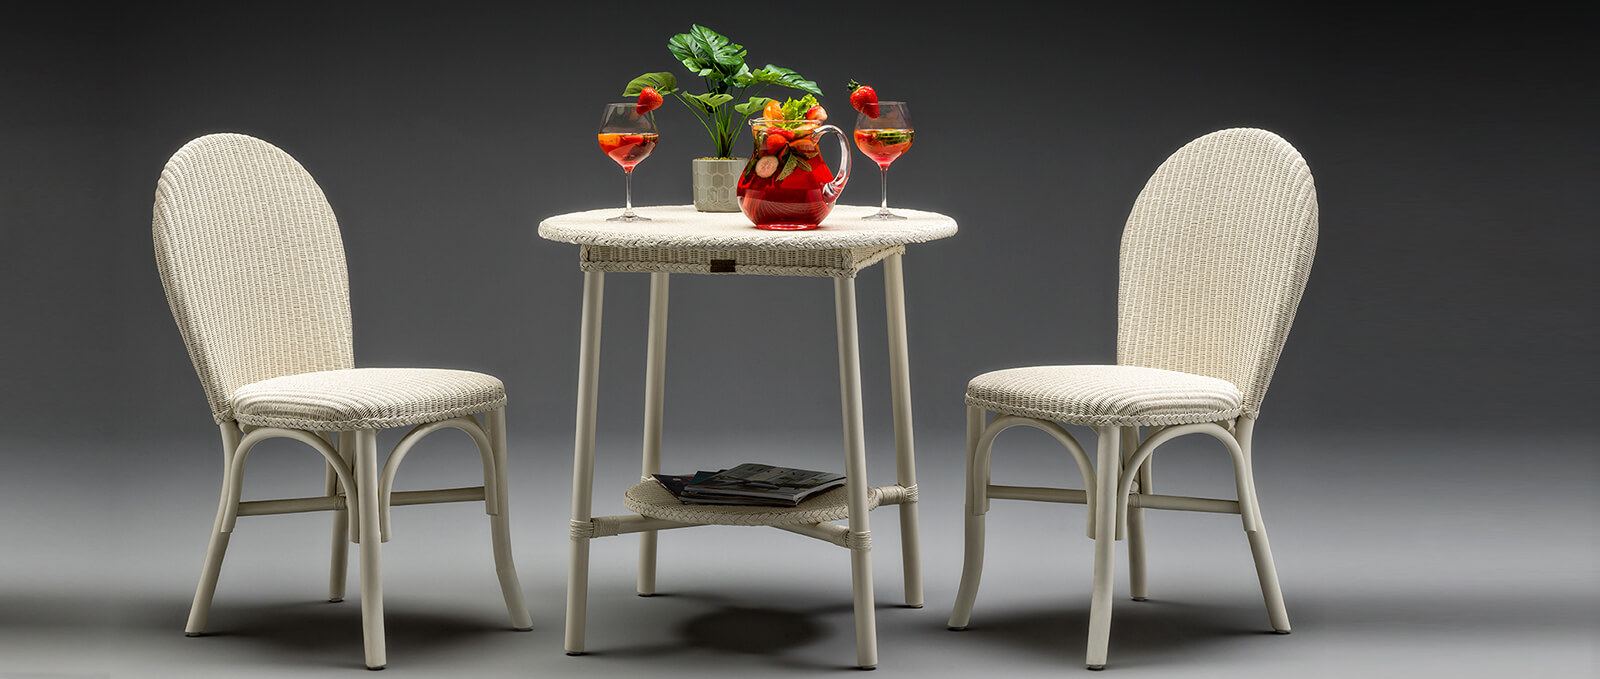 Lloyd Loom Chair and Table Set